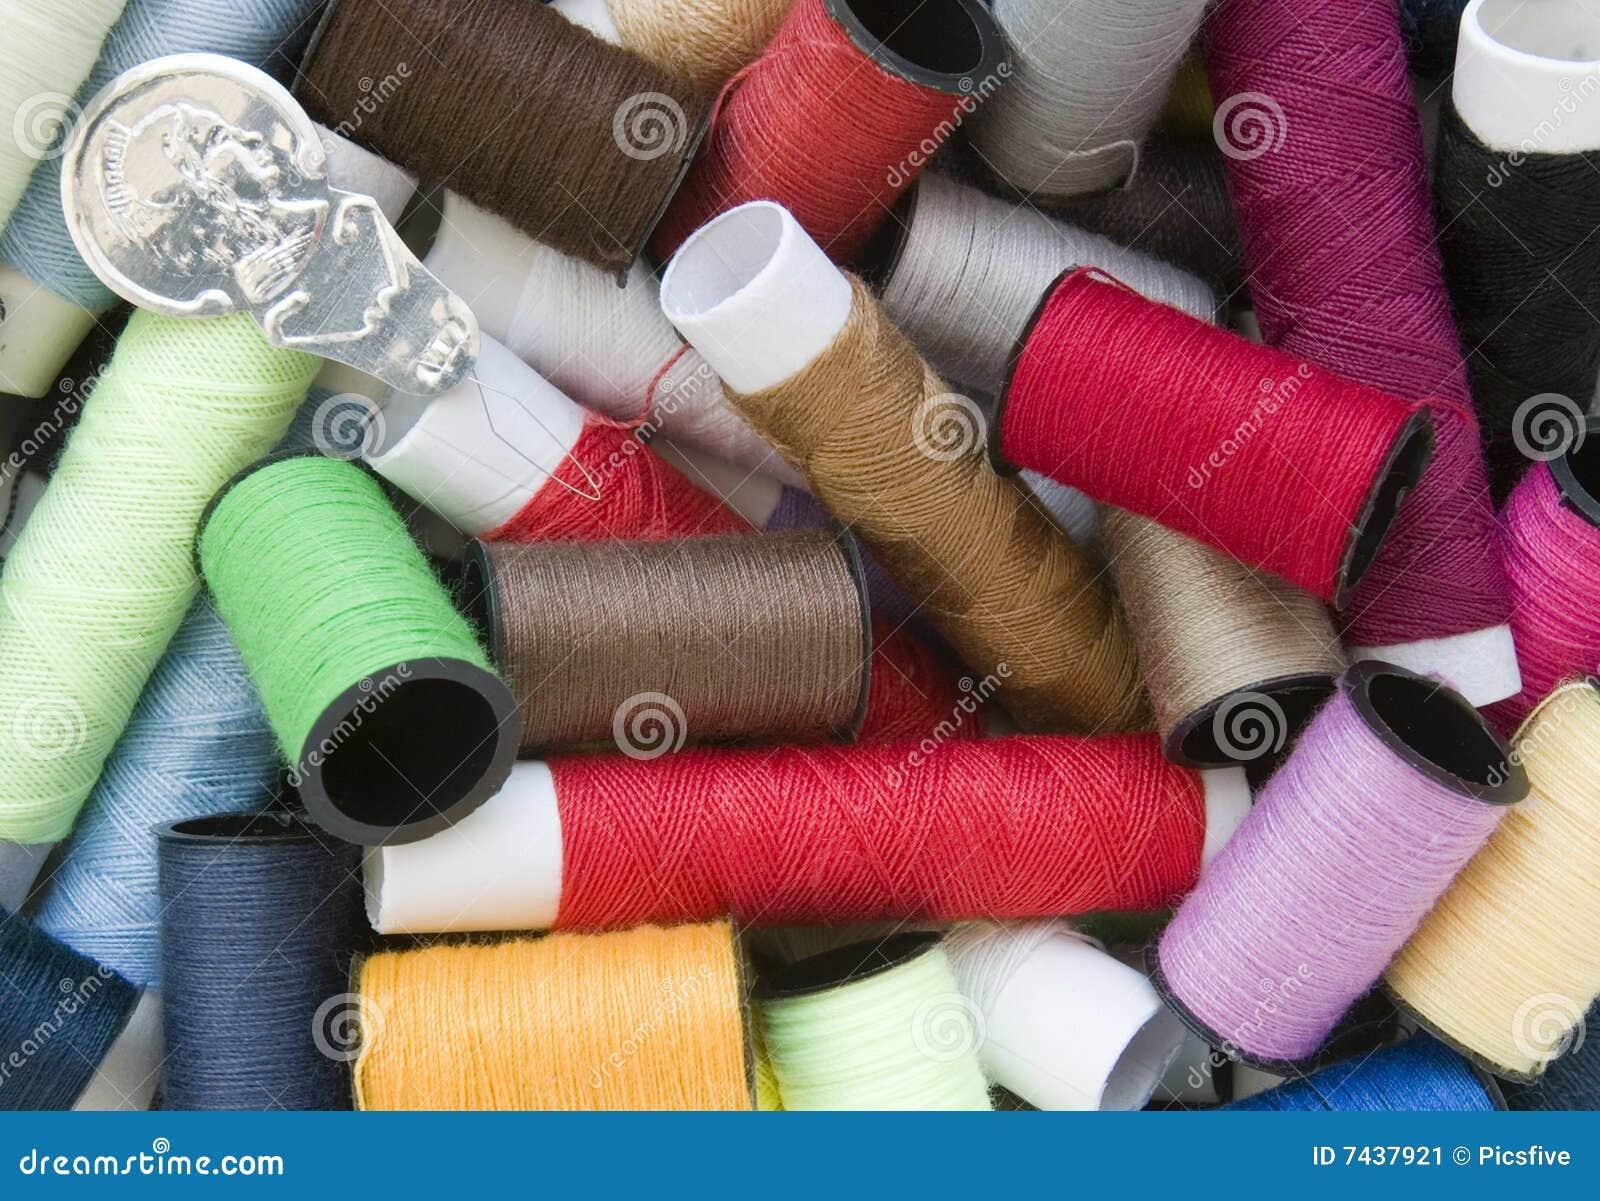 Dressmaking business plan